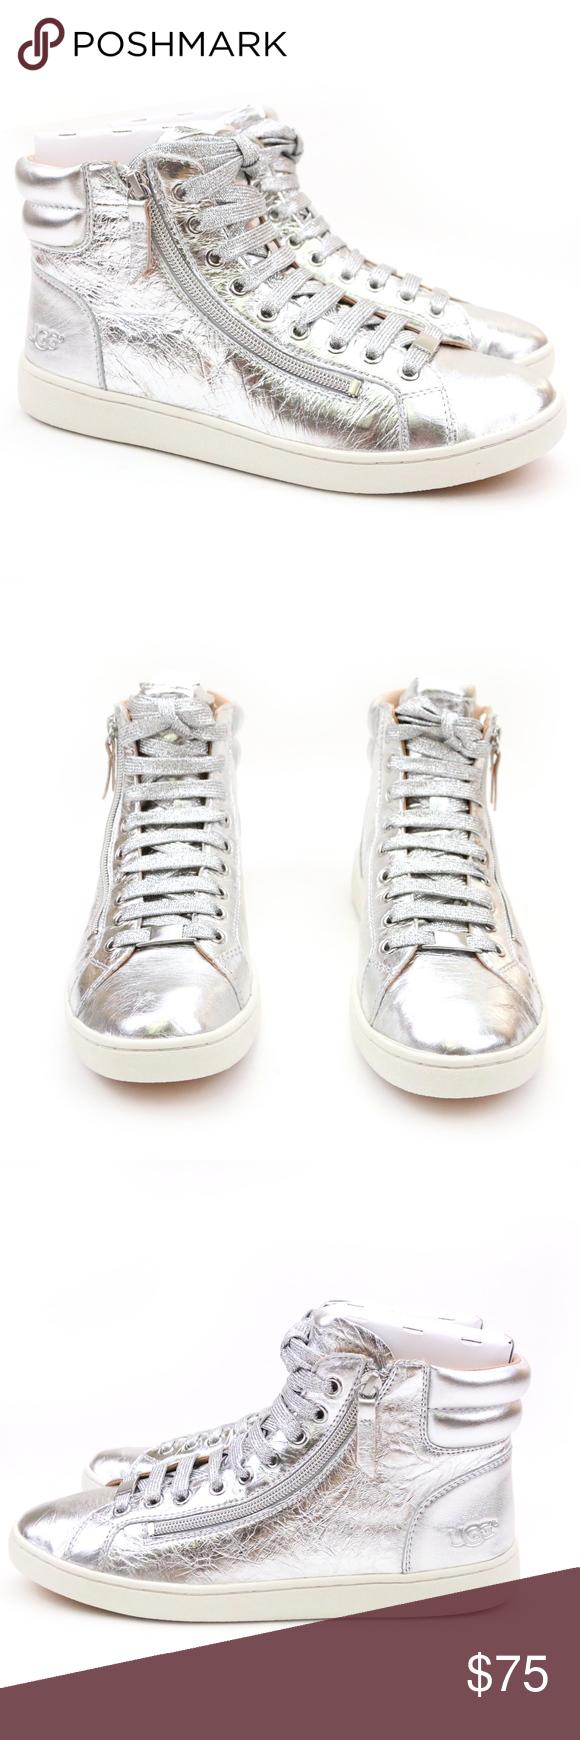 UGG OLIVE Metallic Silver High Top